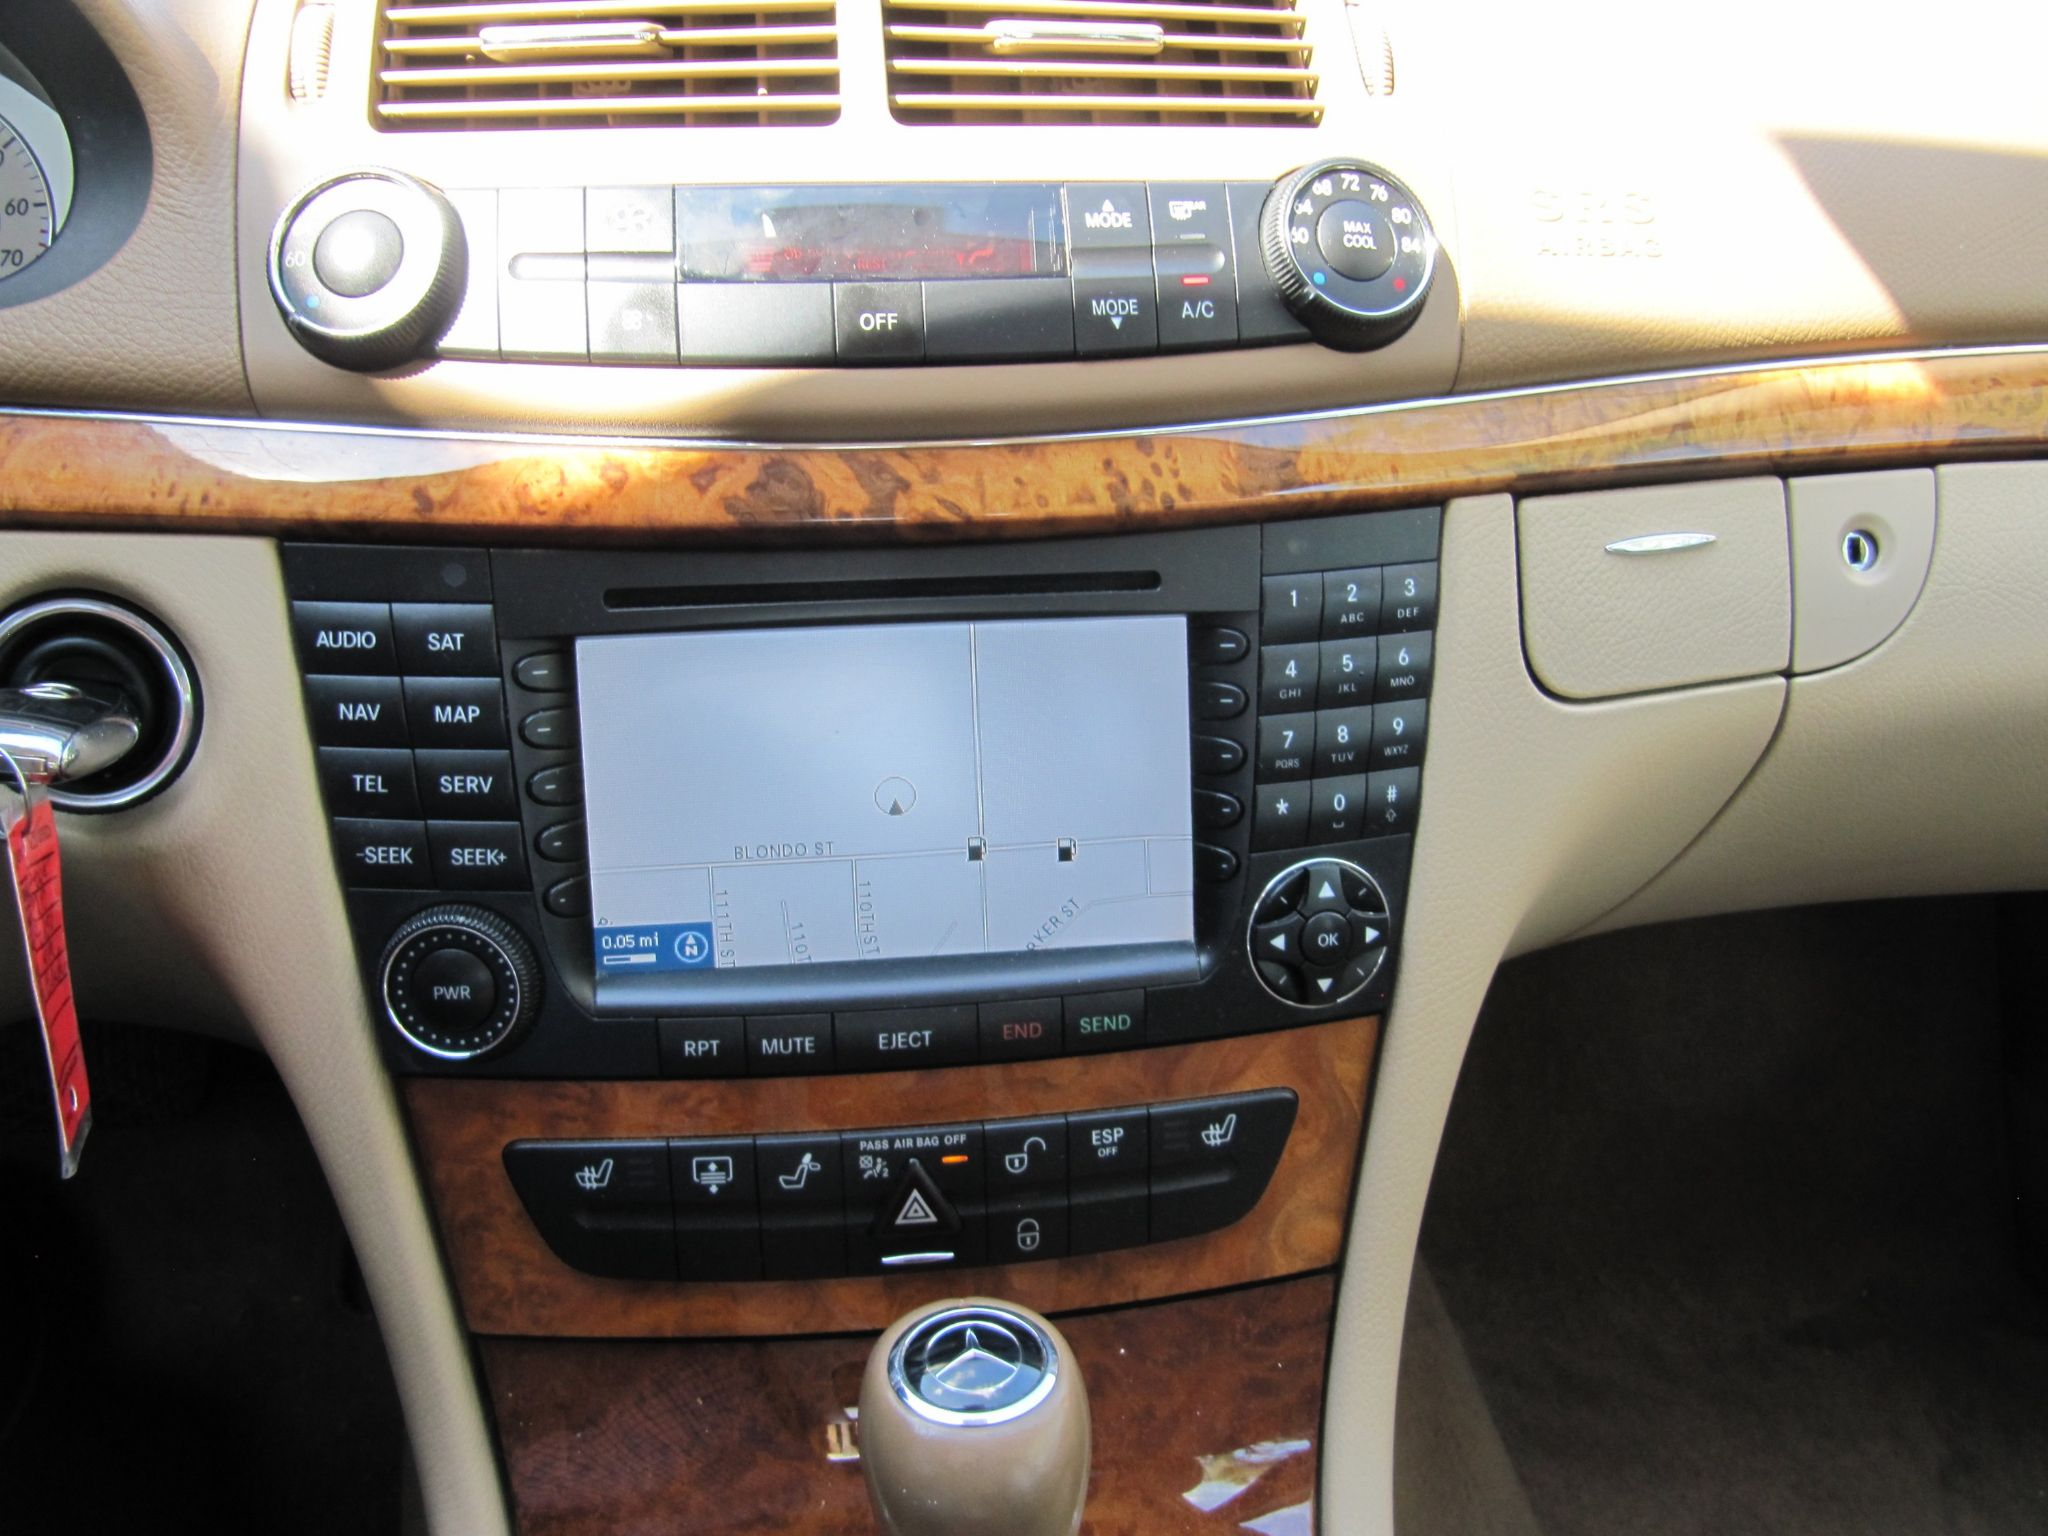 2008 MERCEDES BENZ E350 4MATIC 15